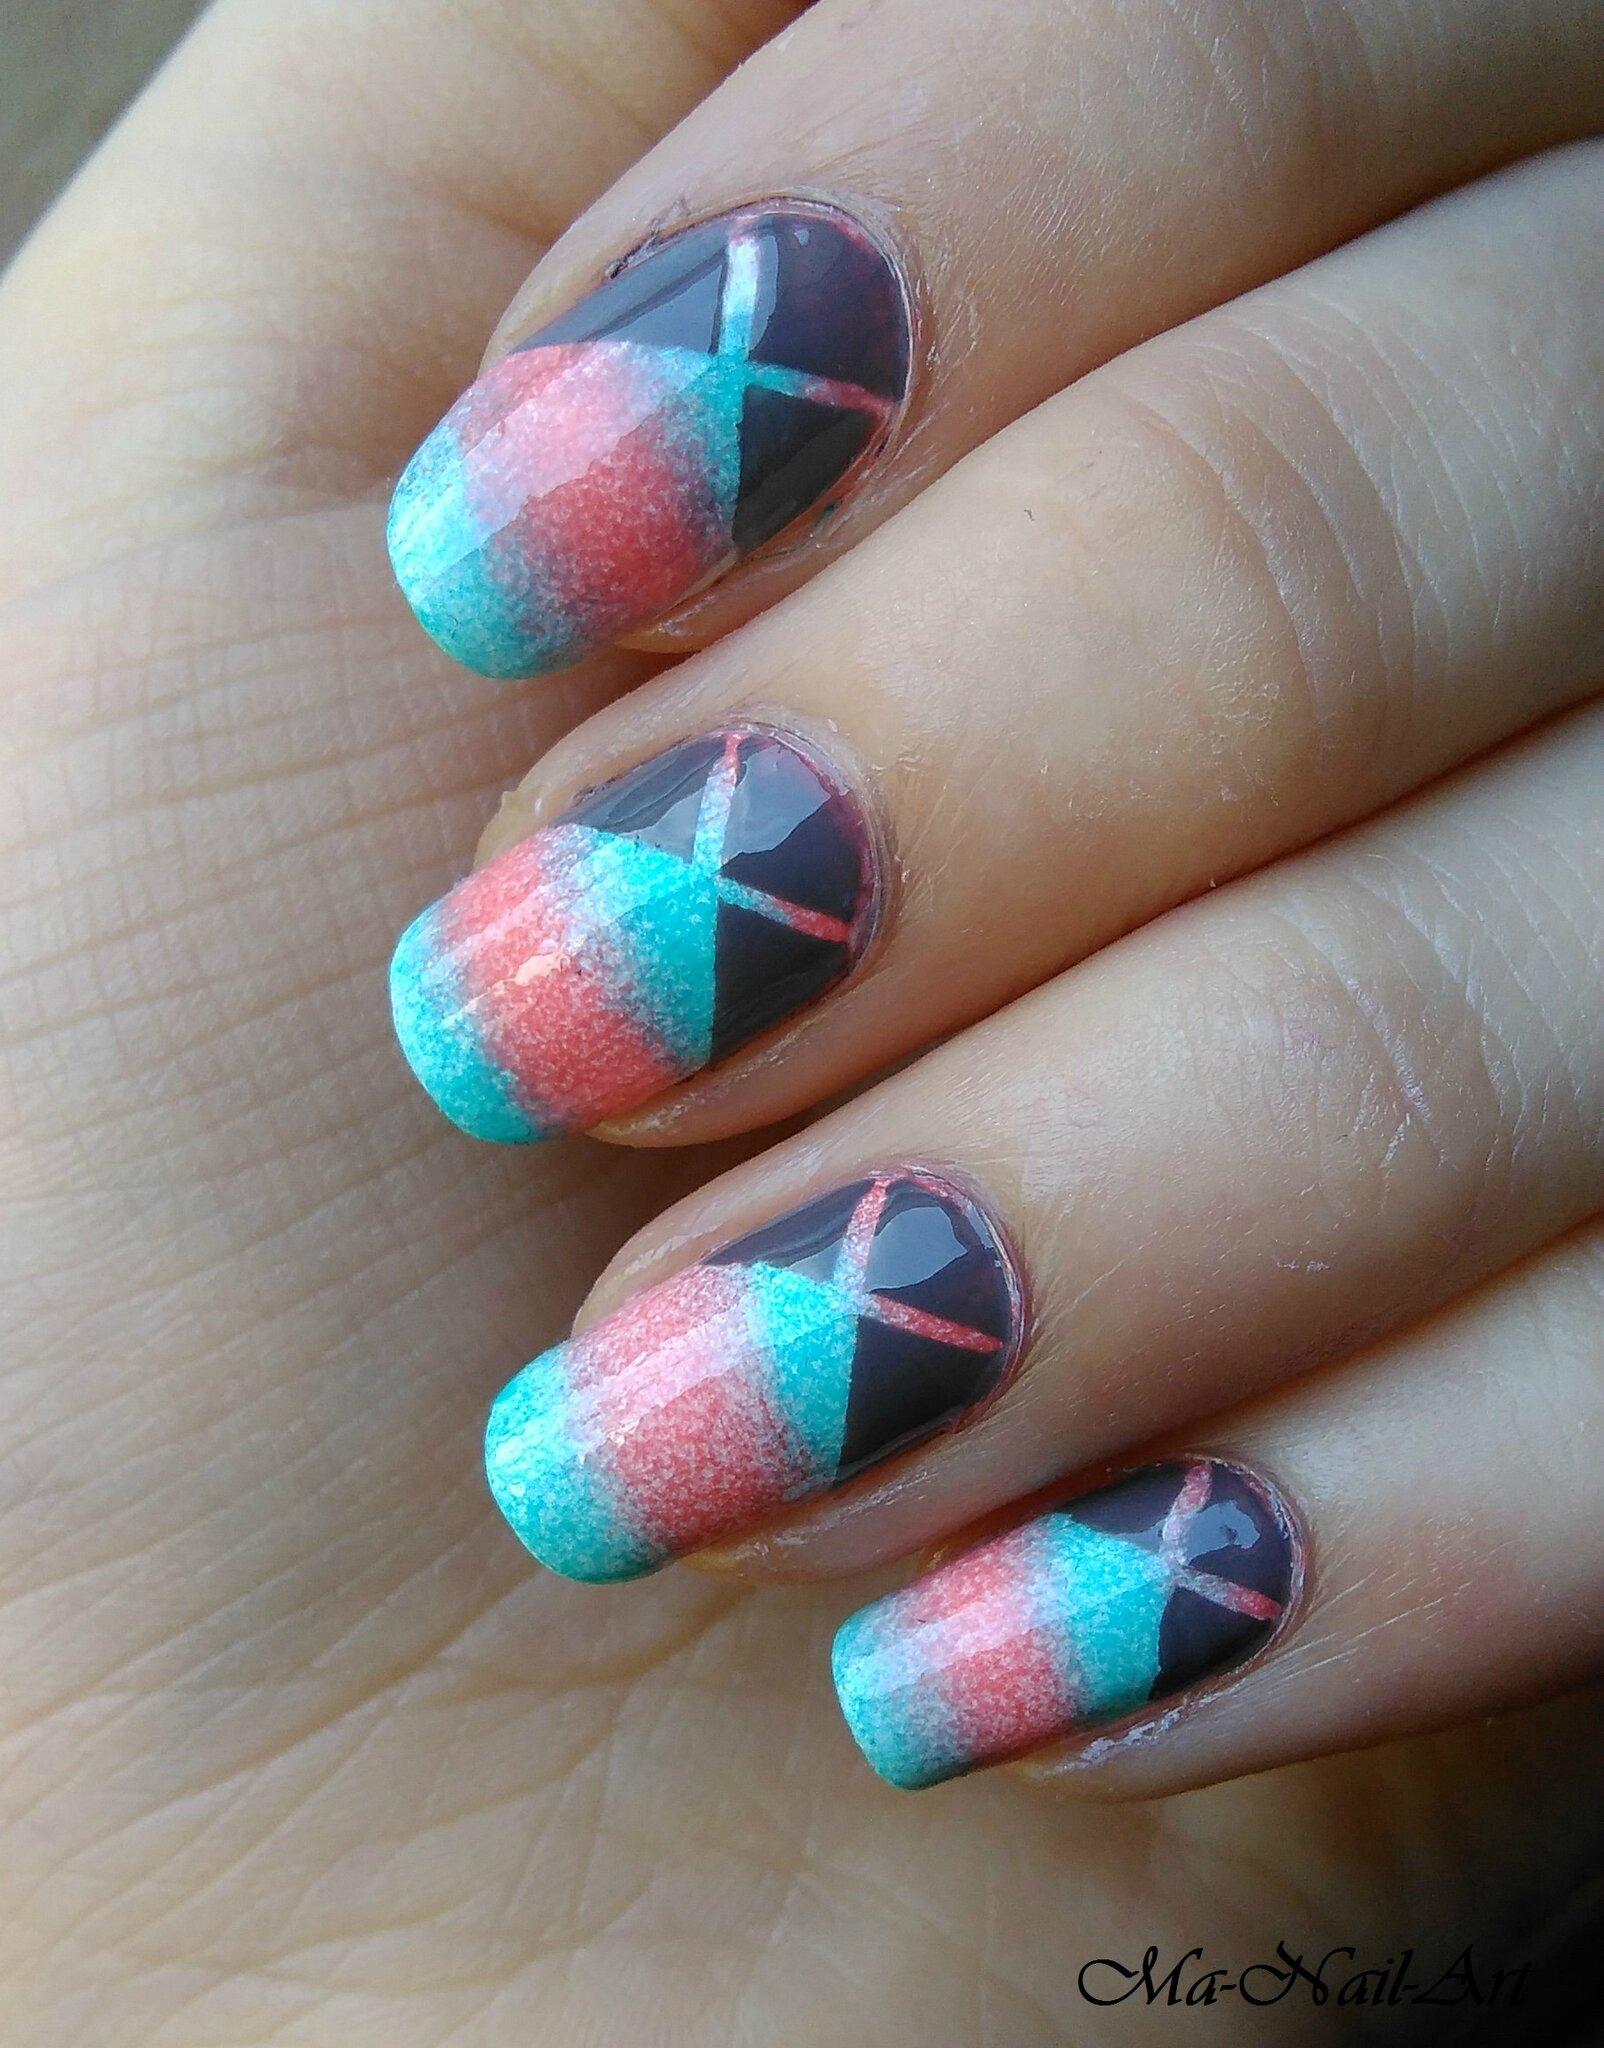 Img 20150510 135243 - Nail art bleu ...